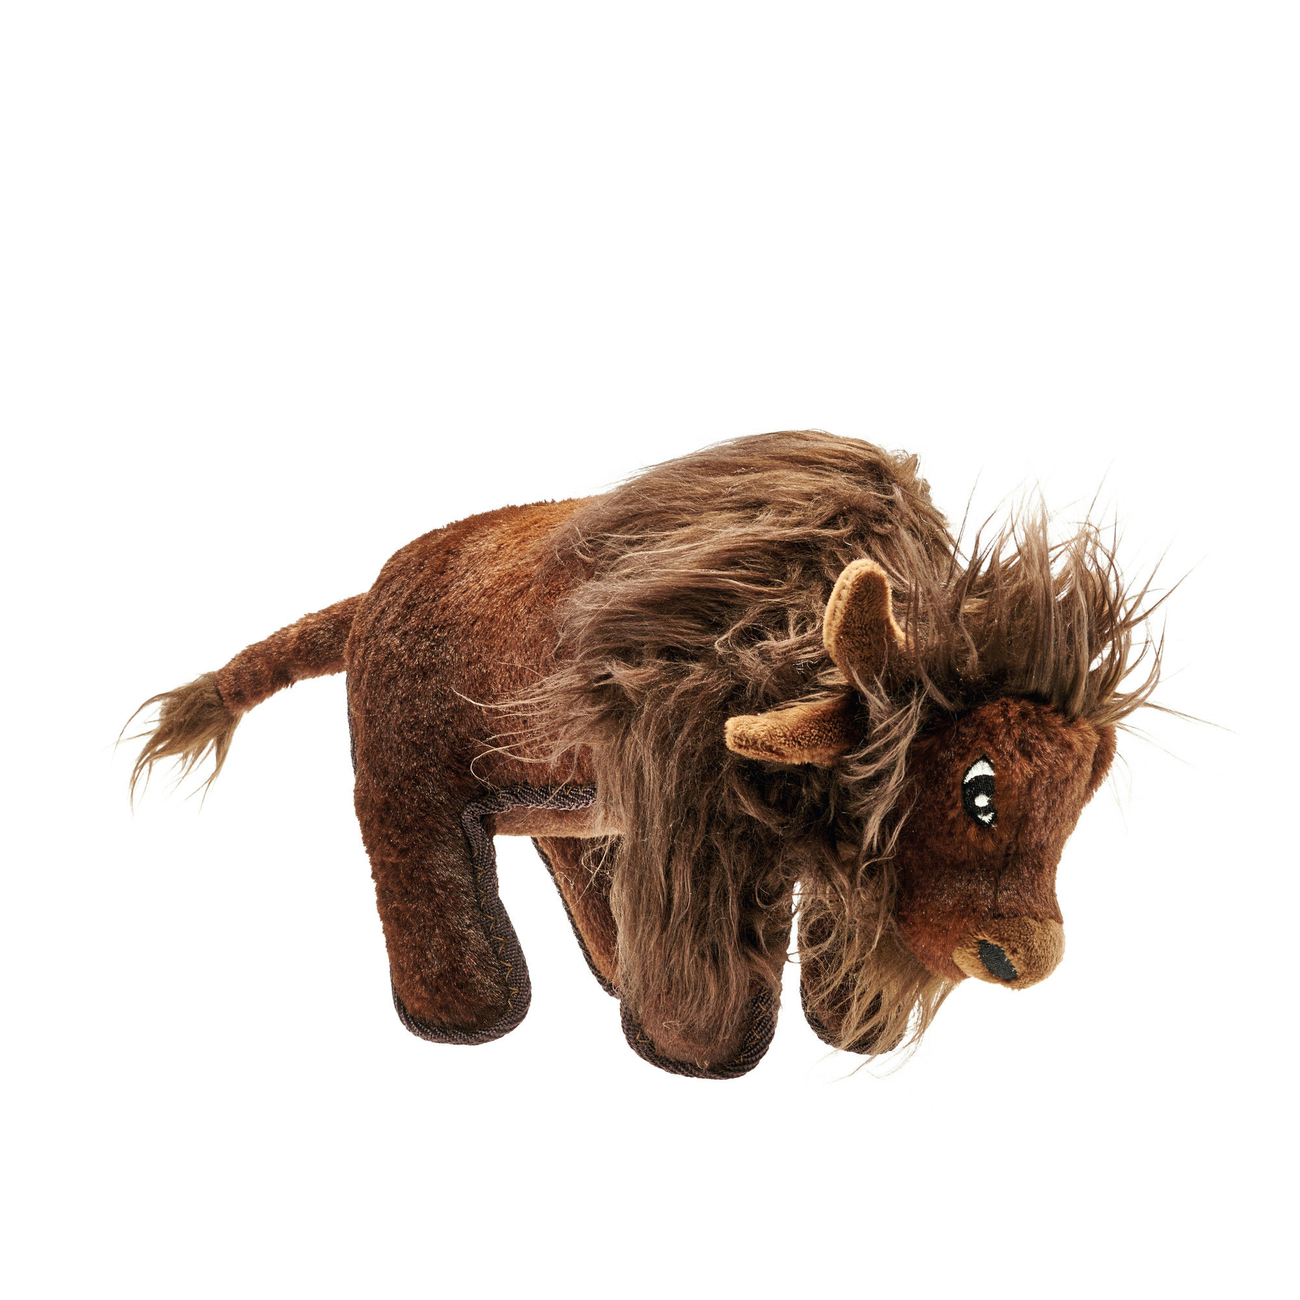 Hunter Hundespielzeug Tough Kamerun Stofftier, Bison, 24 cm